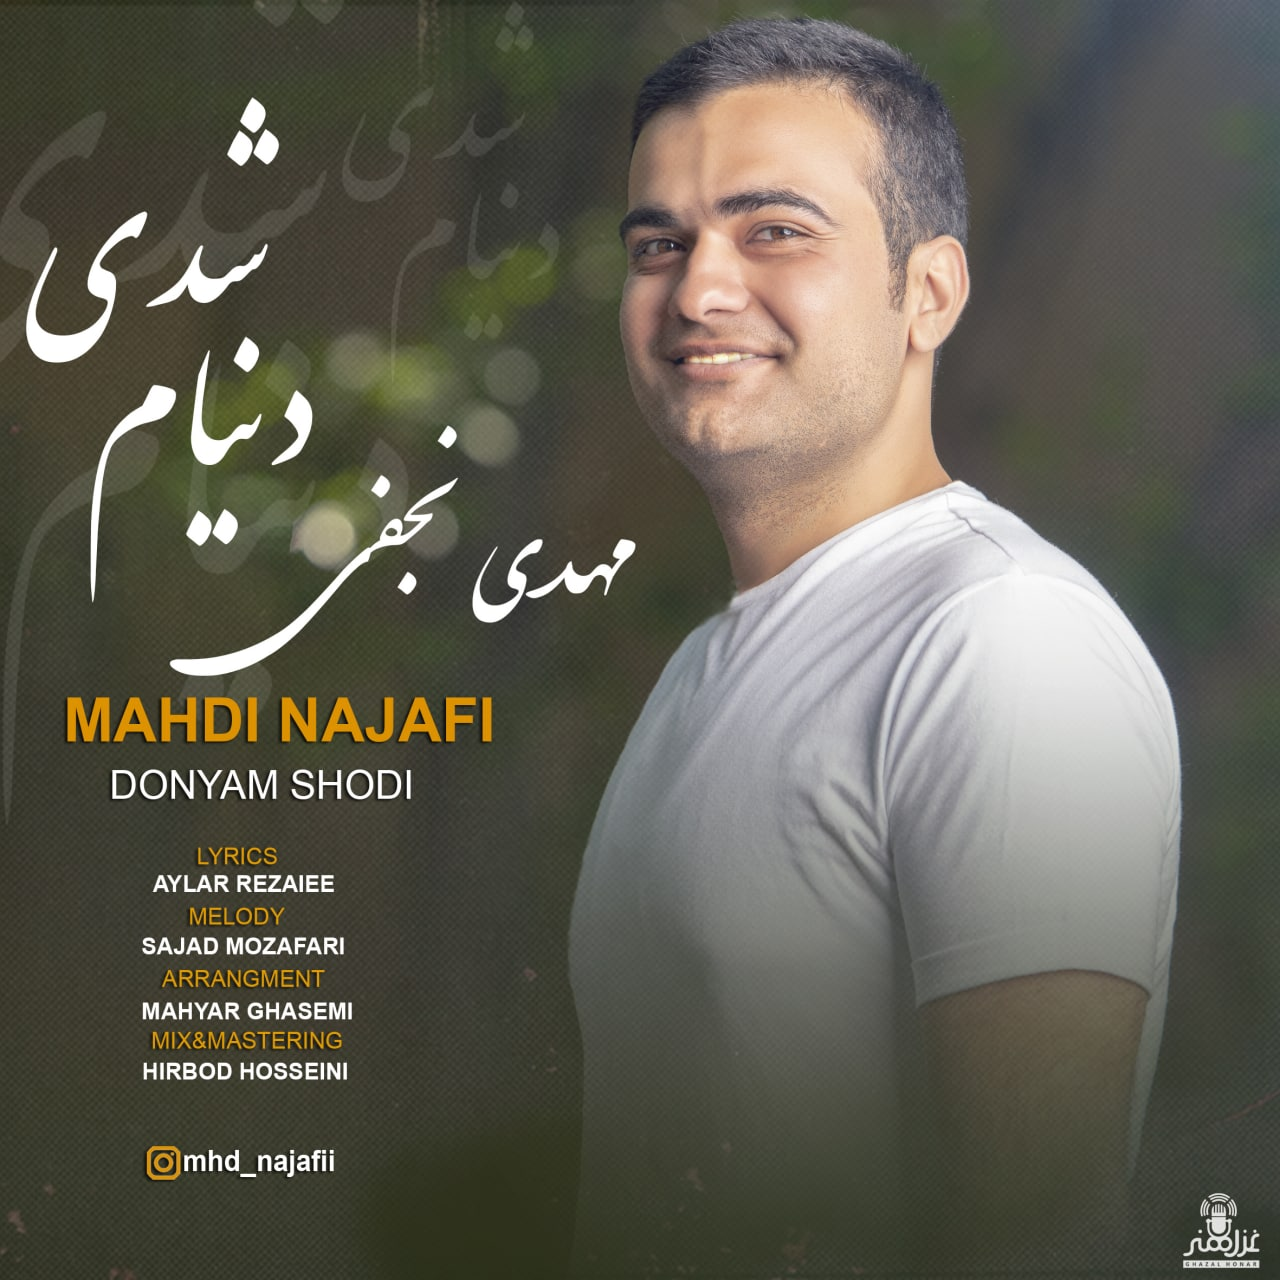 Mahdi Najafi – Donyam Shodi